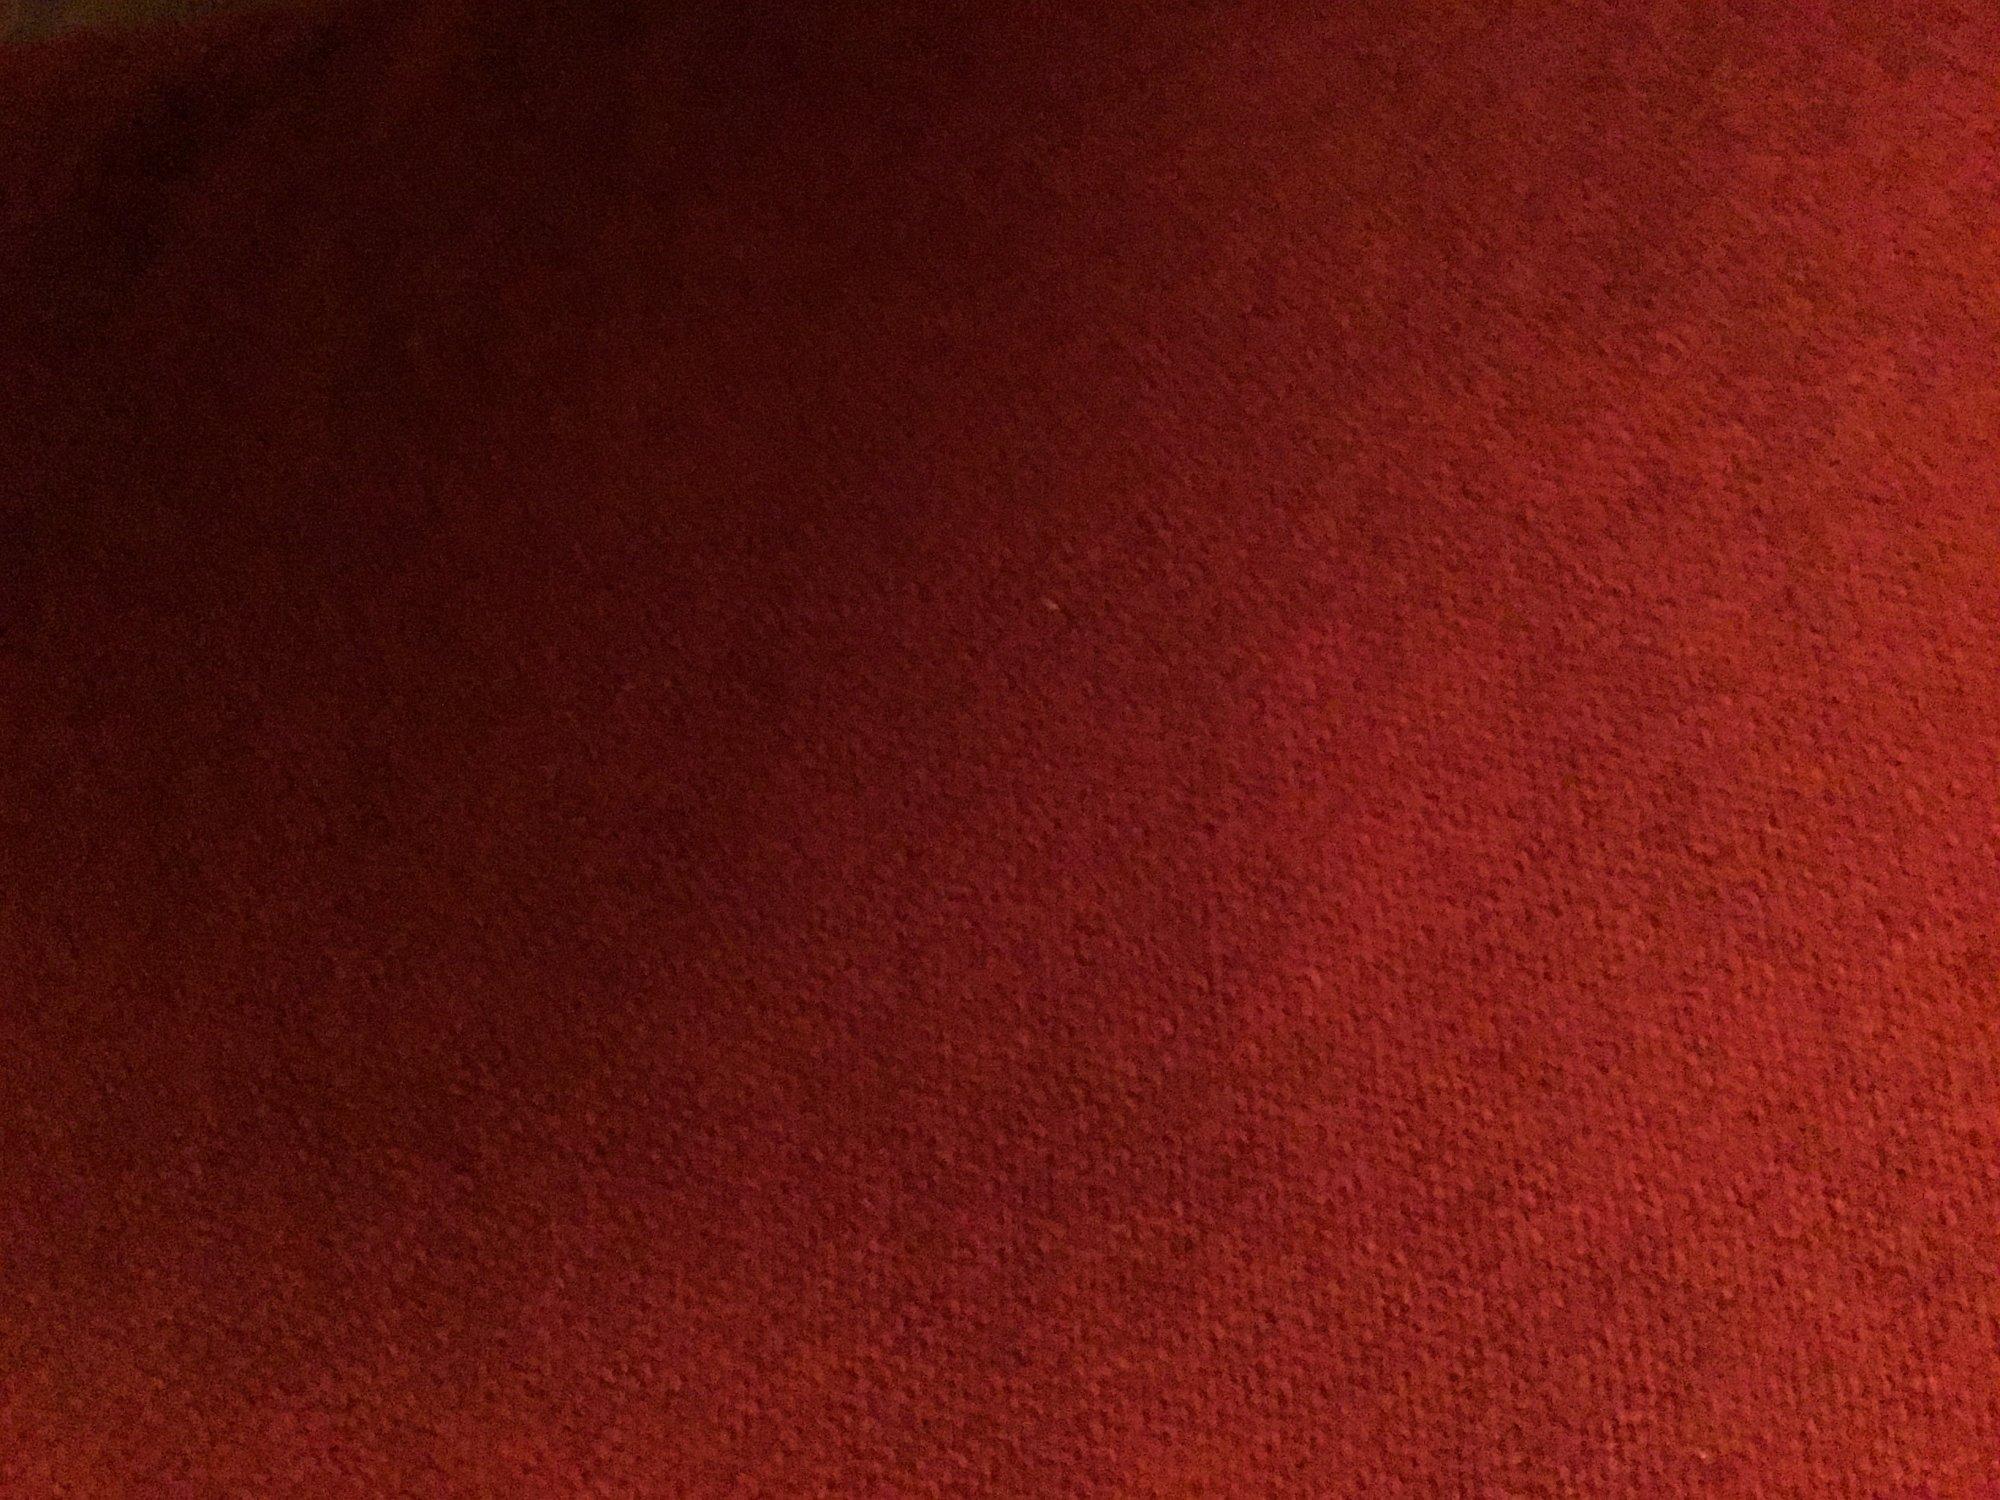 100% Wool Handyed Chili Pepper